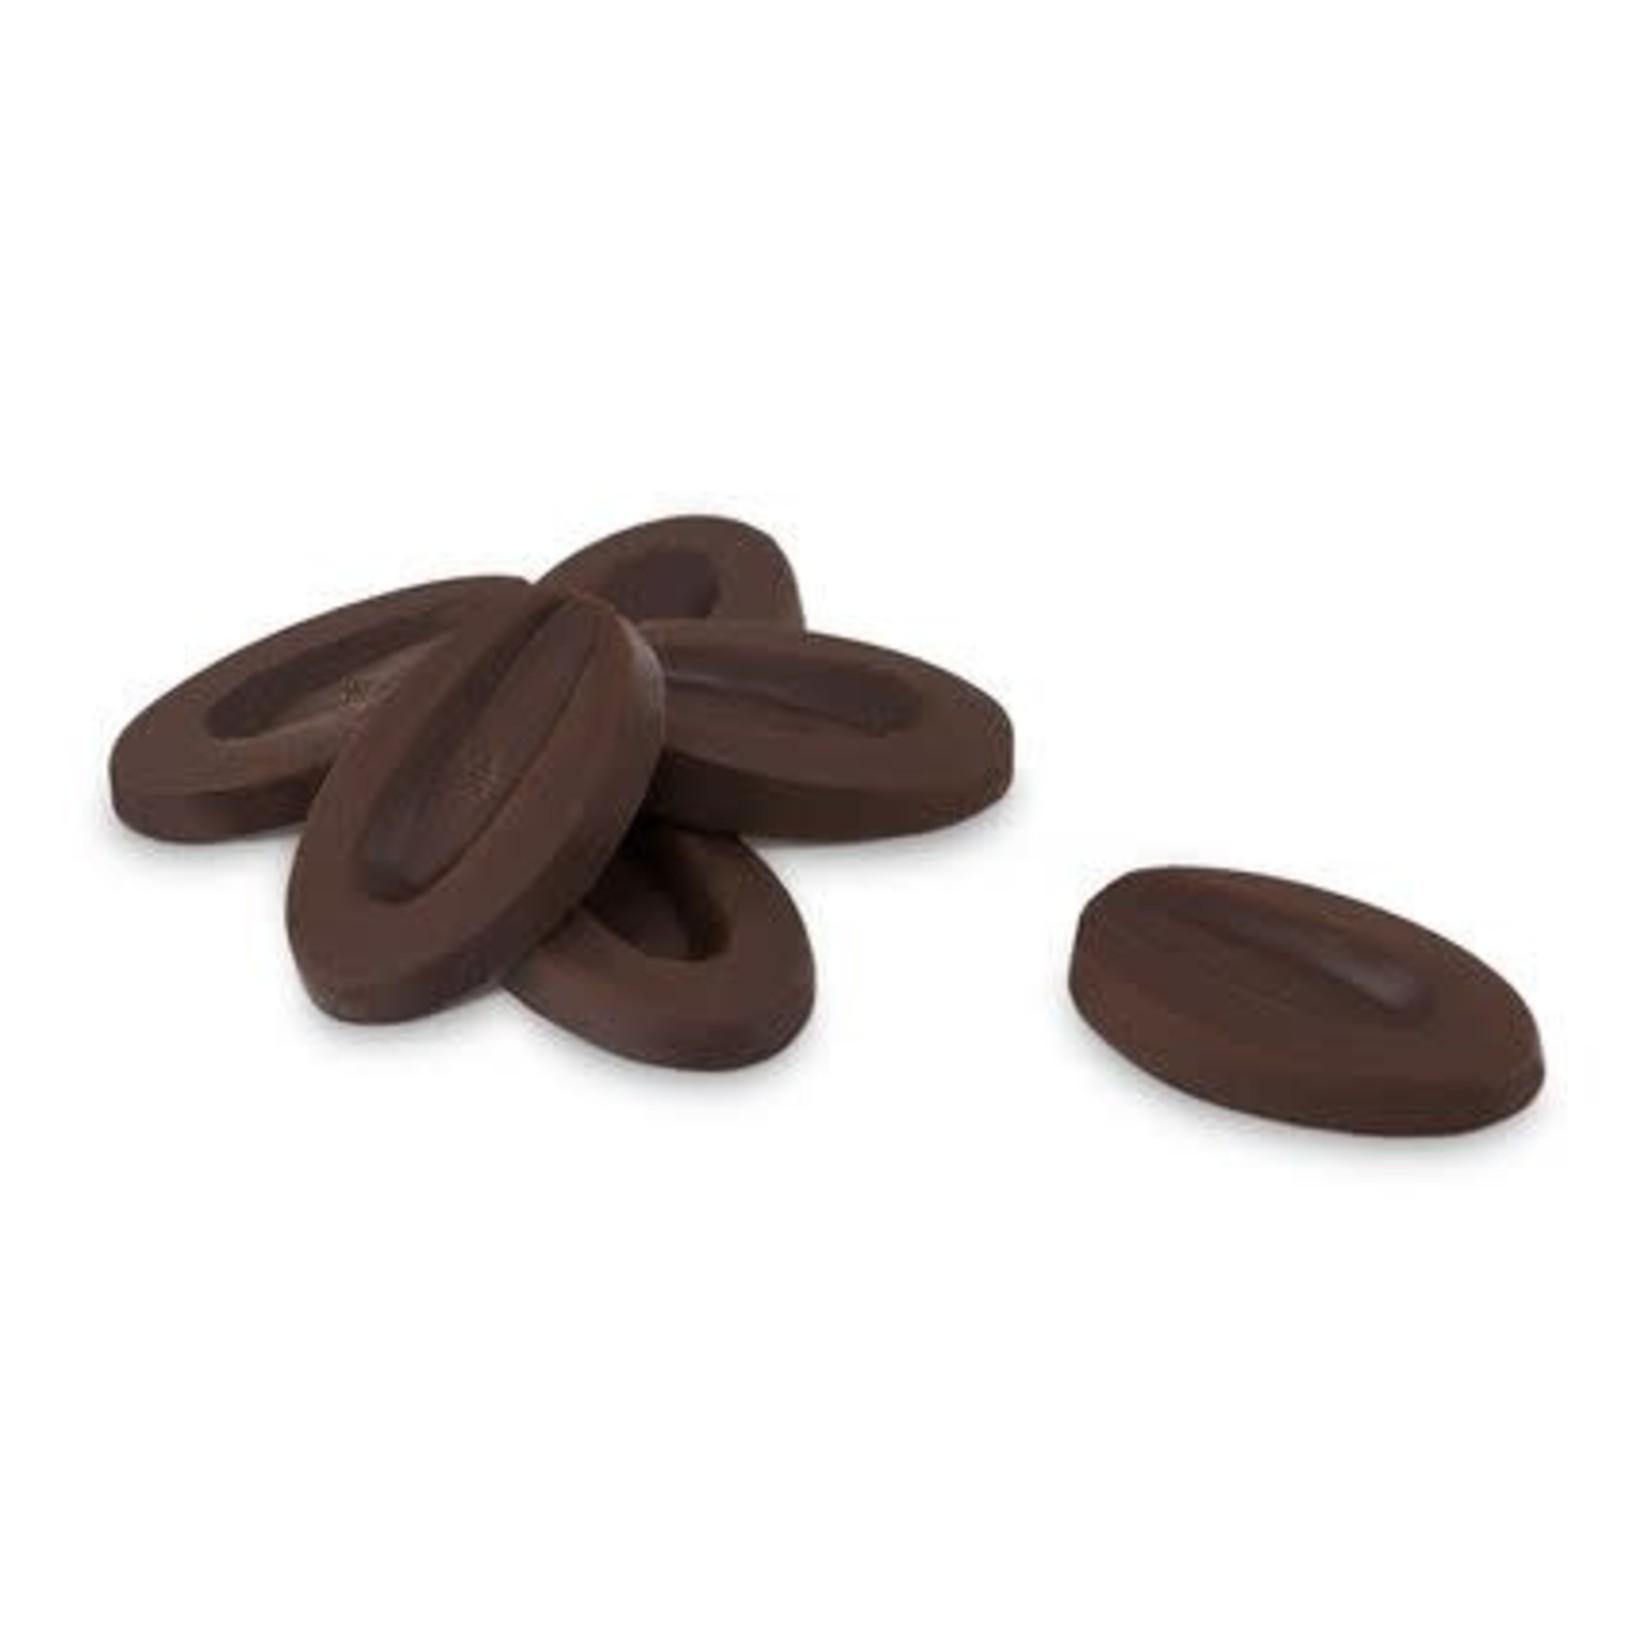 Valrhona Valrhona - Equatoriale Dark Chocolate 55% - 1 lb, 4661-R